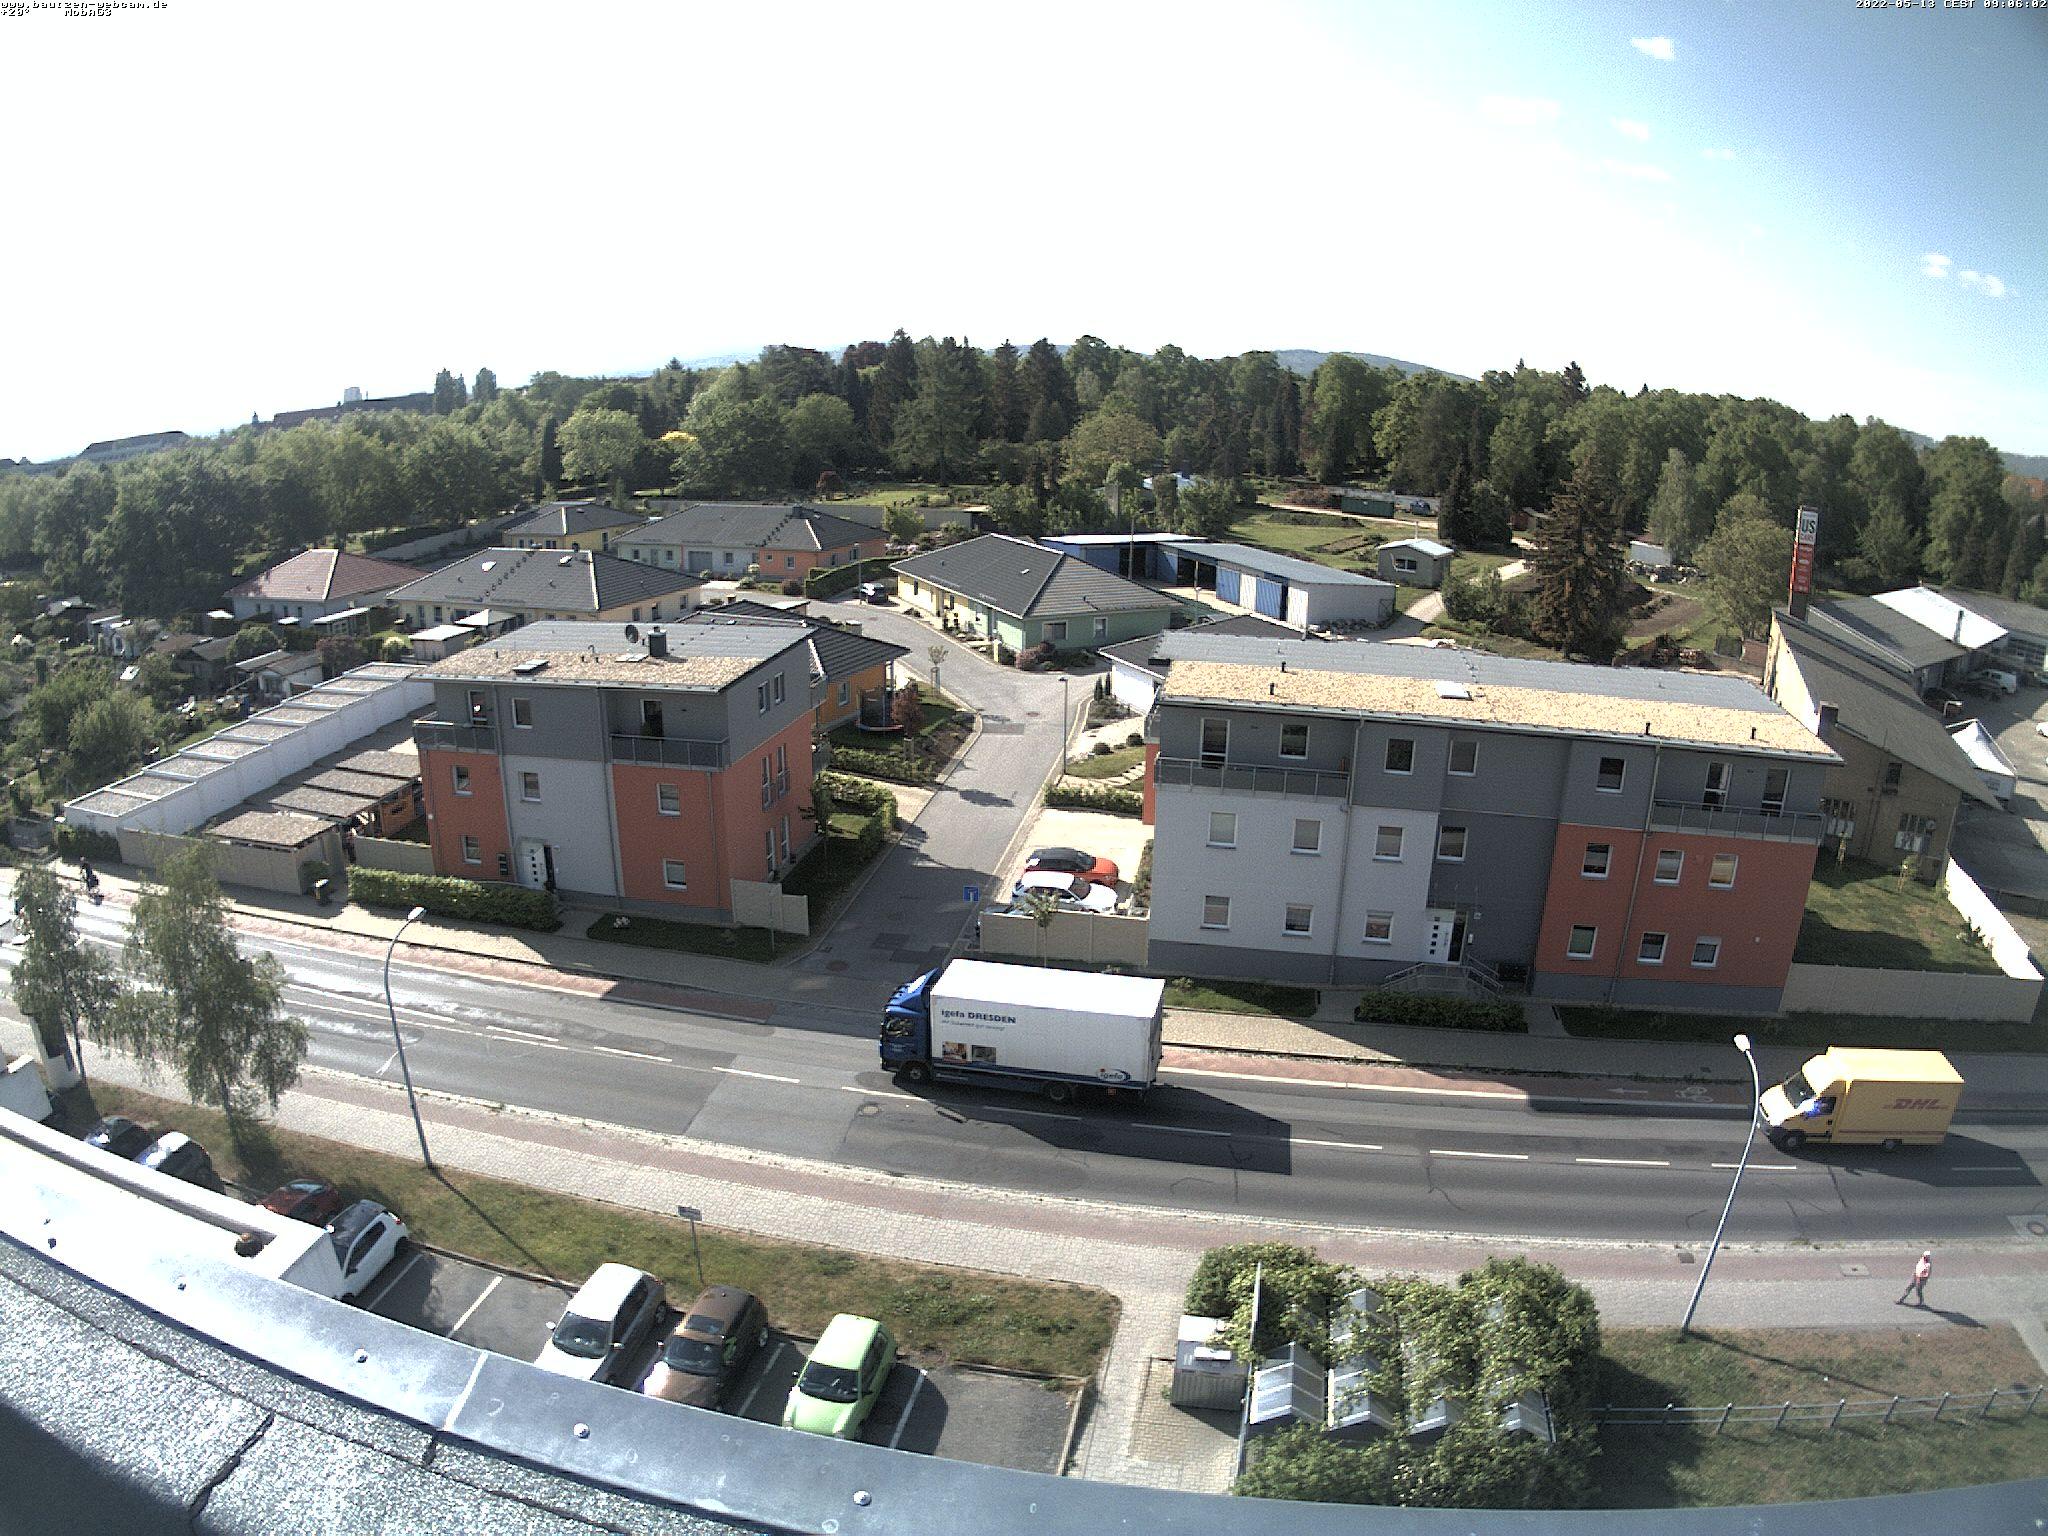 Webcam Bautzen - Ziegelwall